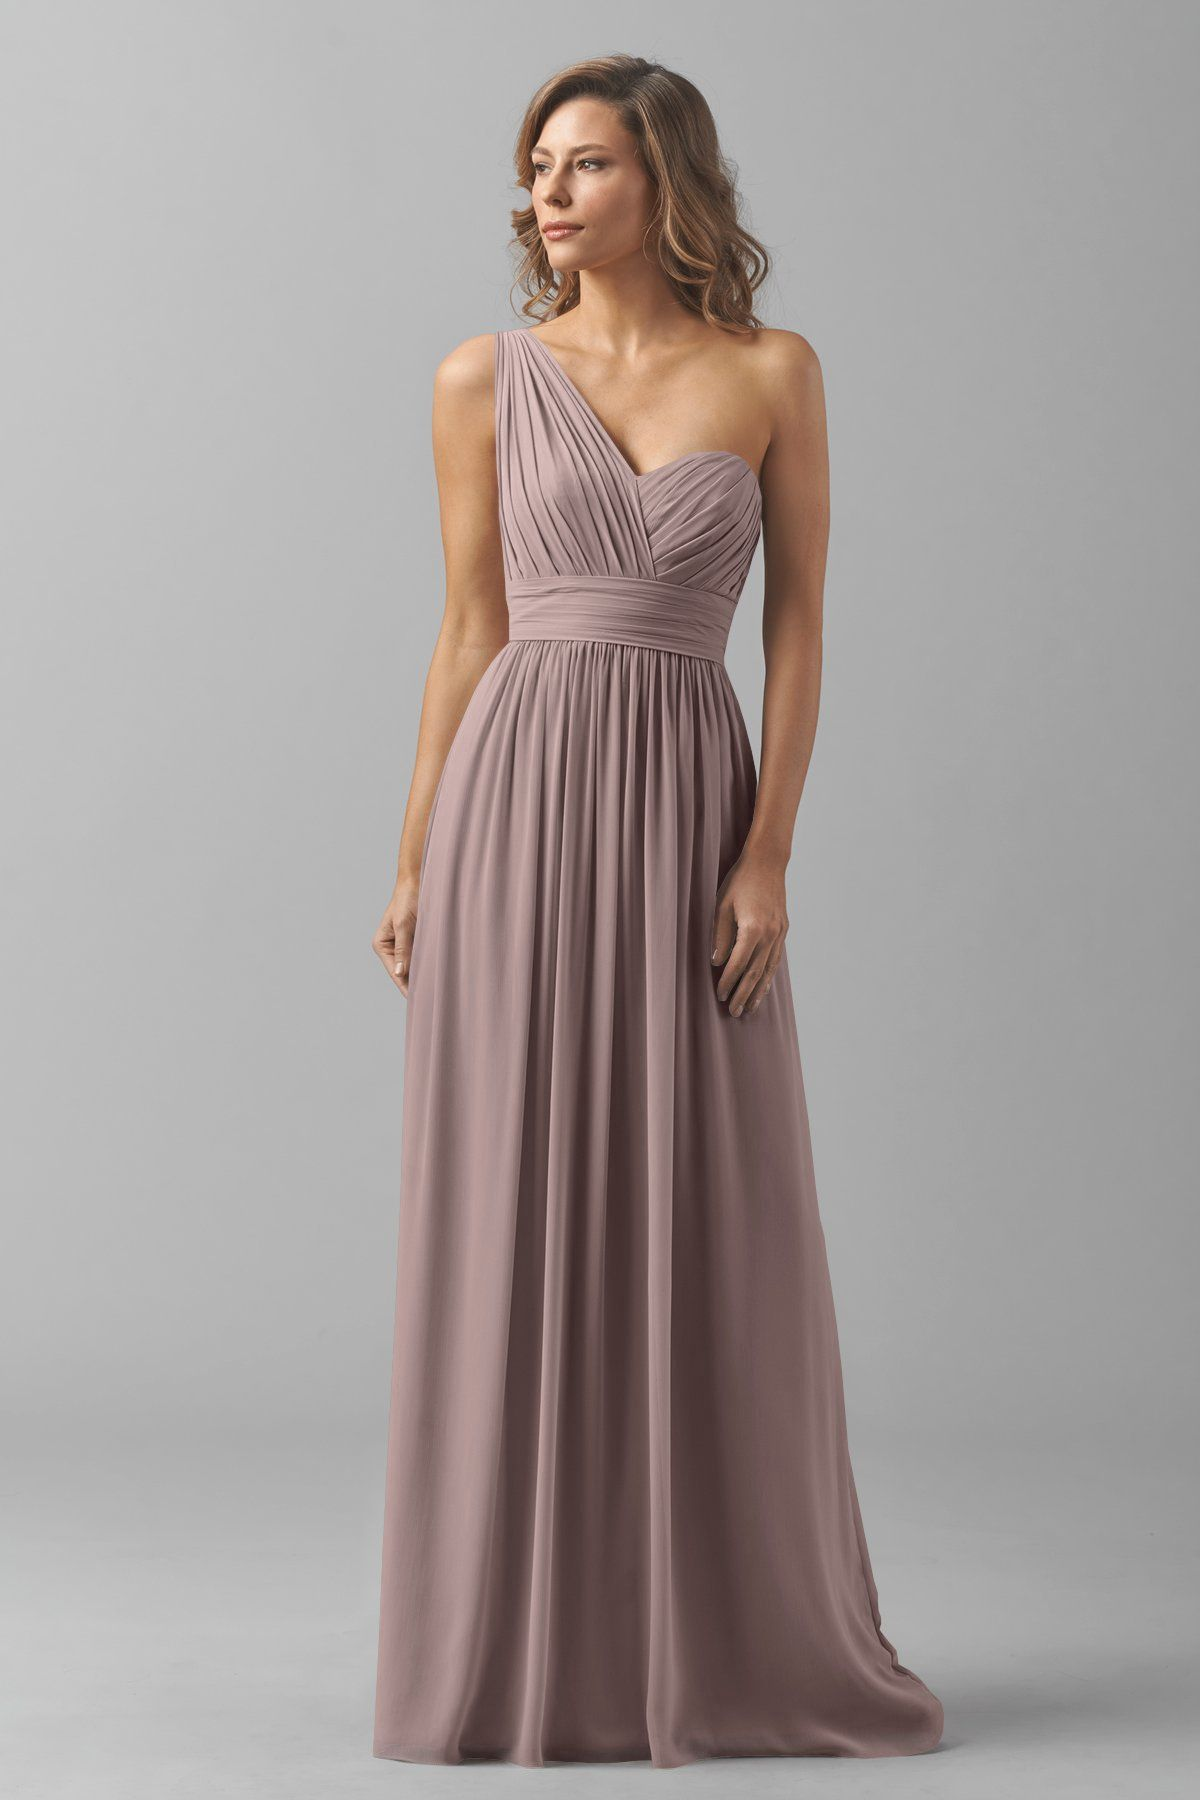 261 orig 290 at bella bridesmaids watters maids for Colors of wedding dresses